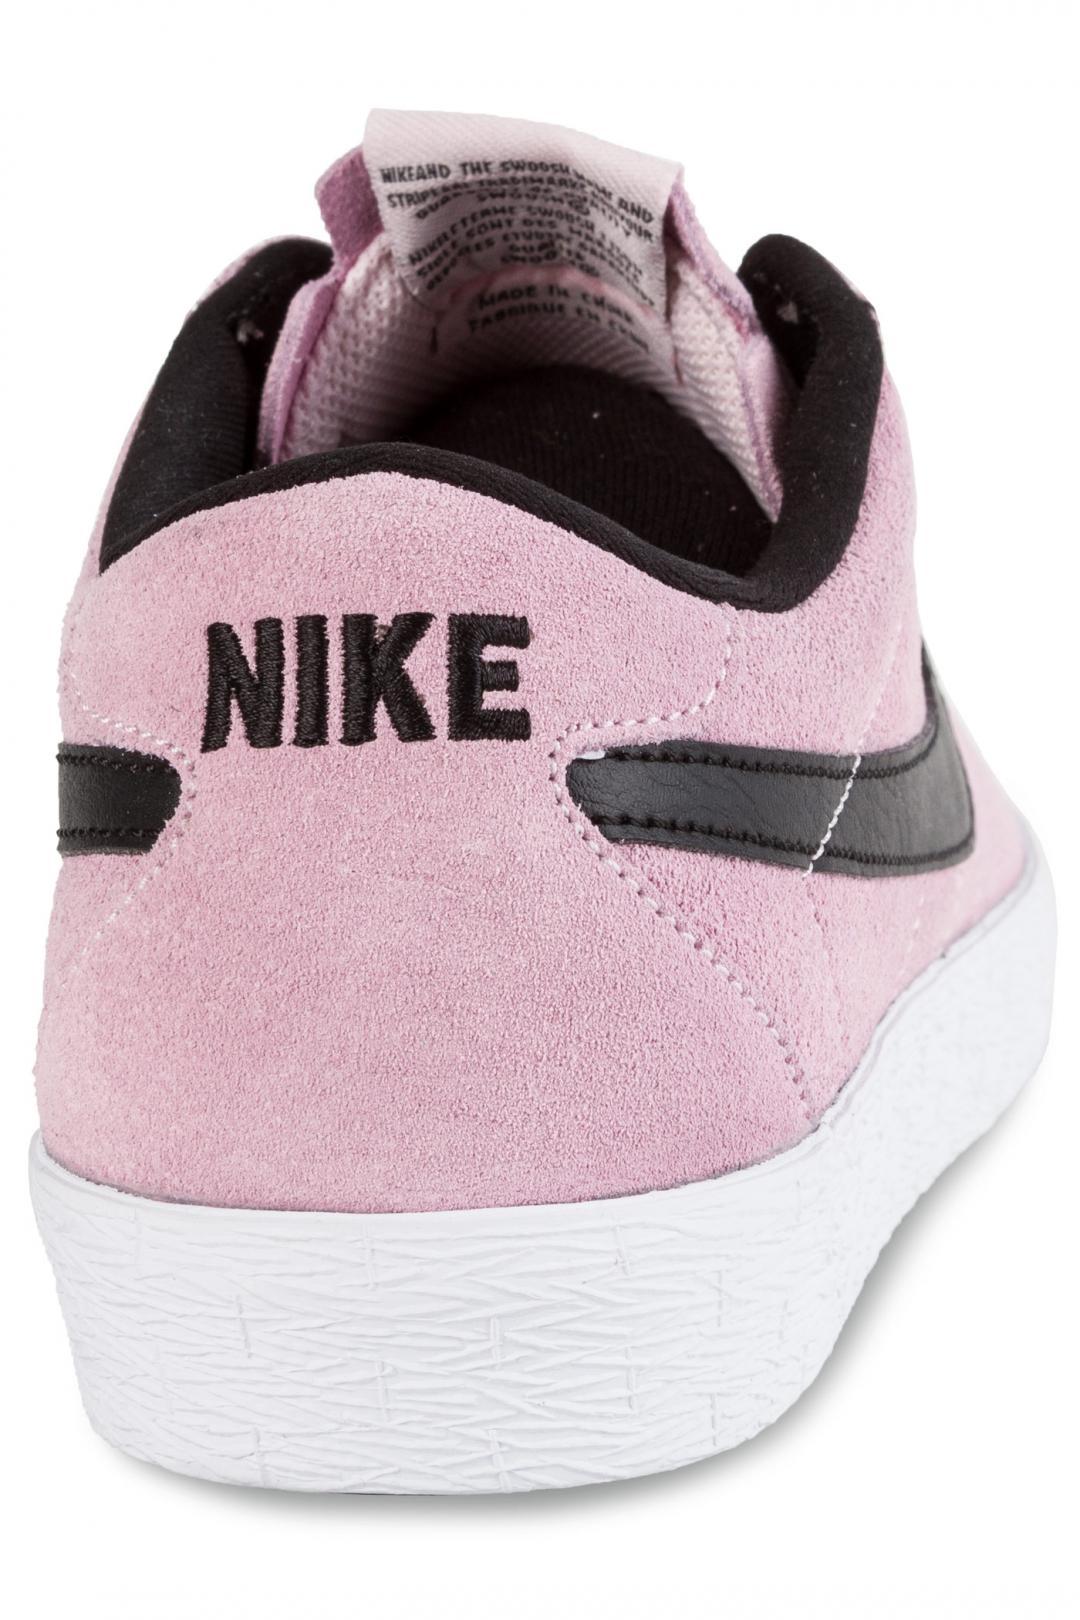 Uomo Nike SB Zoom Bruin Premium SE prism pink black | Sneakers low top